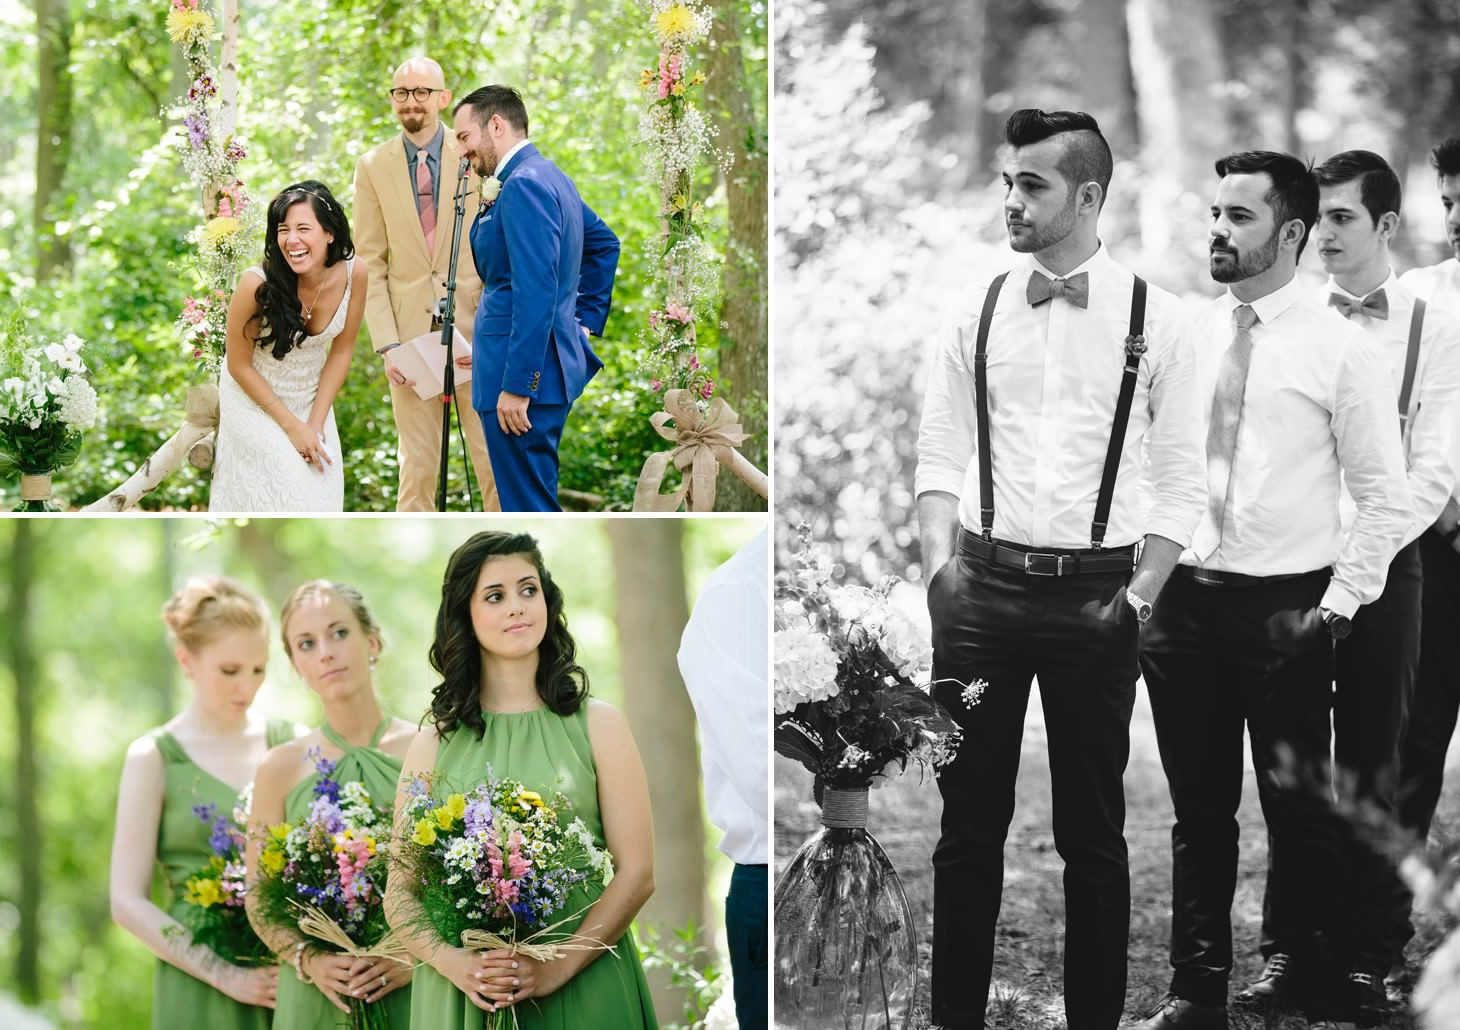 005-nyc-wedding-photographer-smitten-chickens-eco-friendly-outdoor-wedding-.jpg